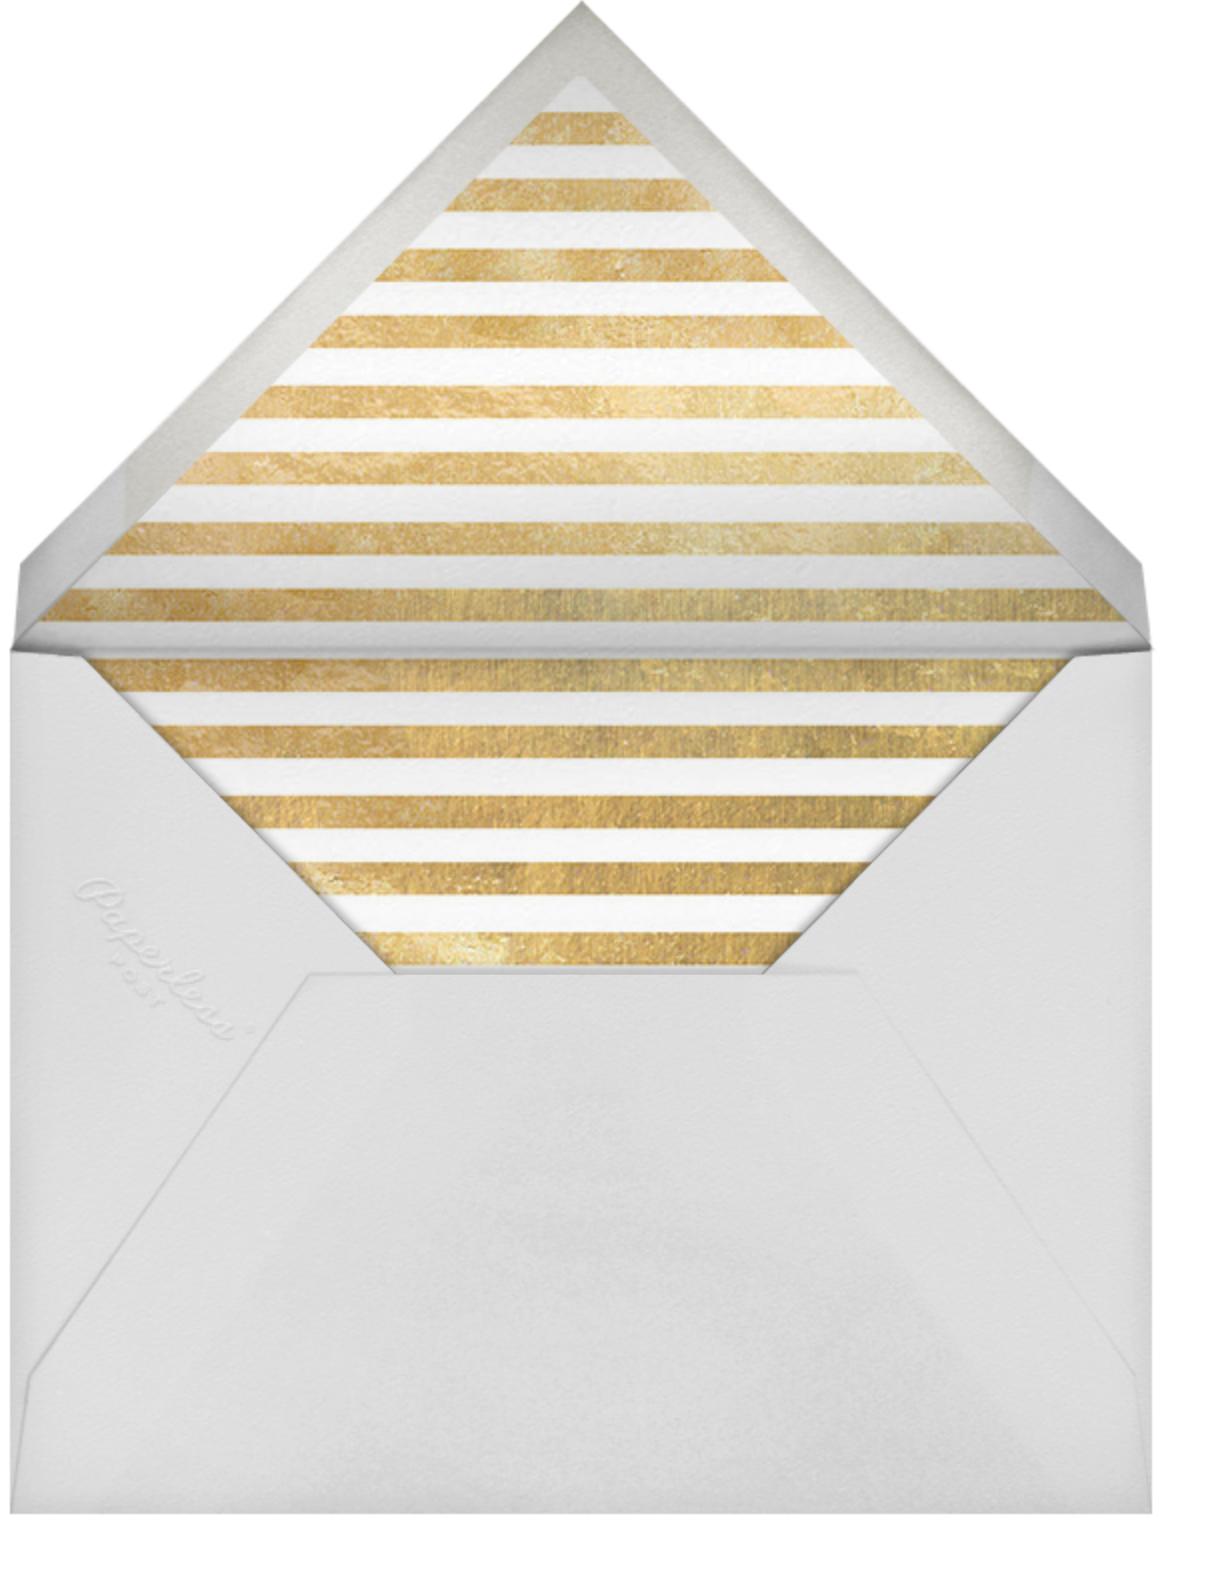 Rose Bed (Invitation) - kate spade new york - All - envelope back